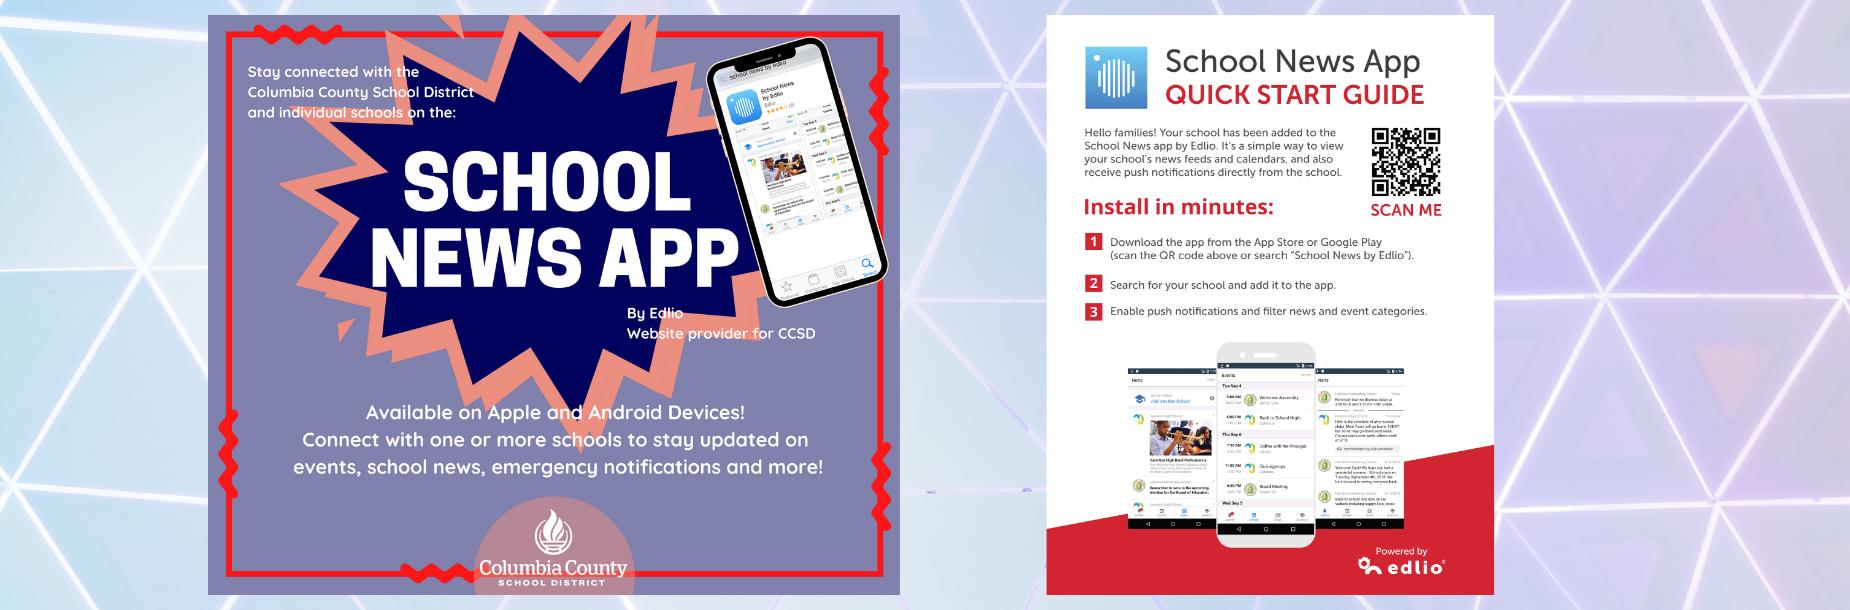 School News App QR Code and information